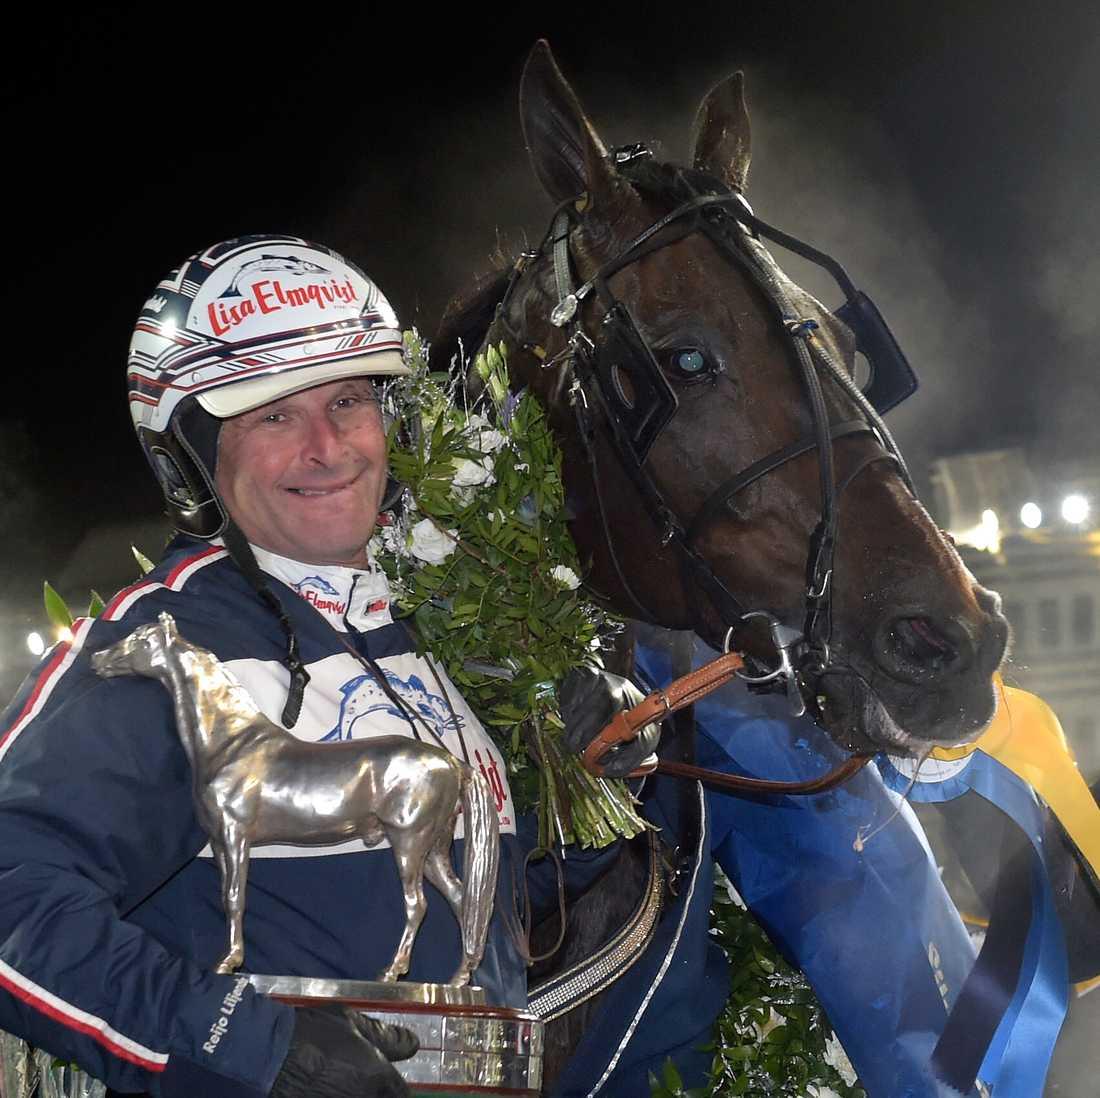 Reijo Liljendahl efter segern med Nadal Broline.